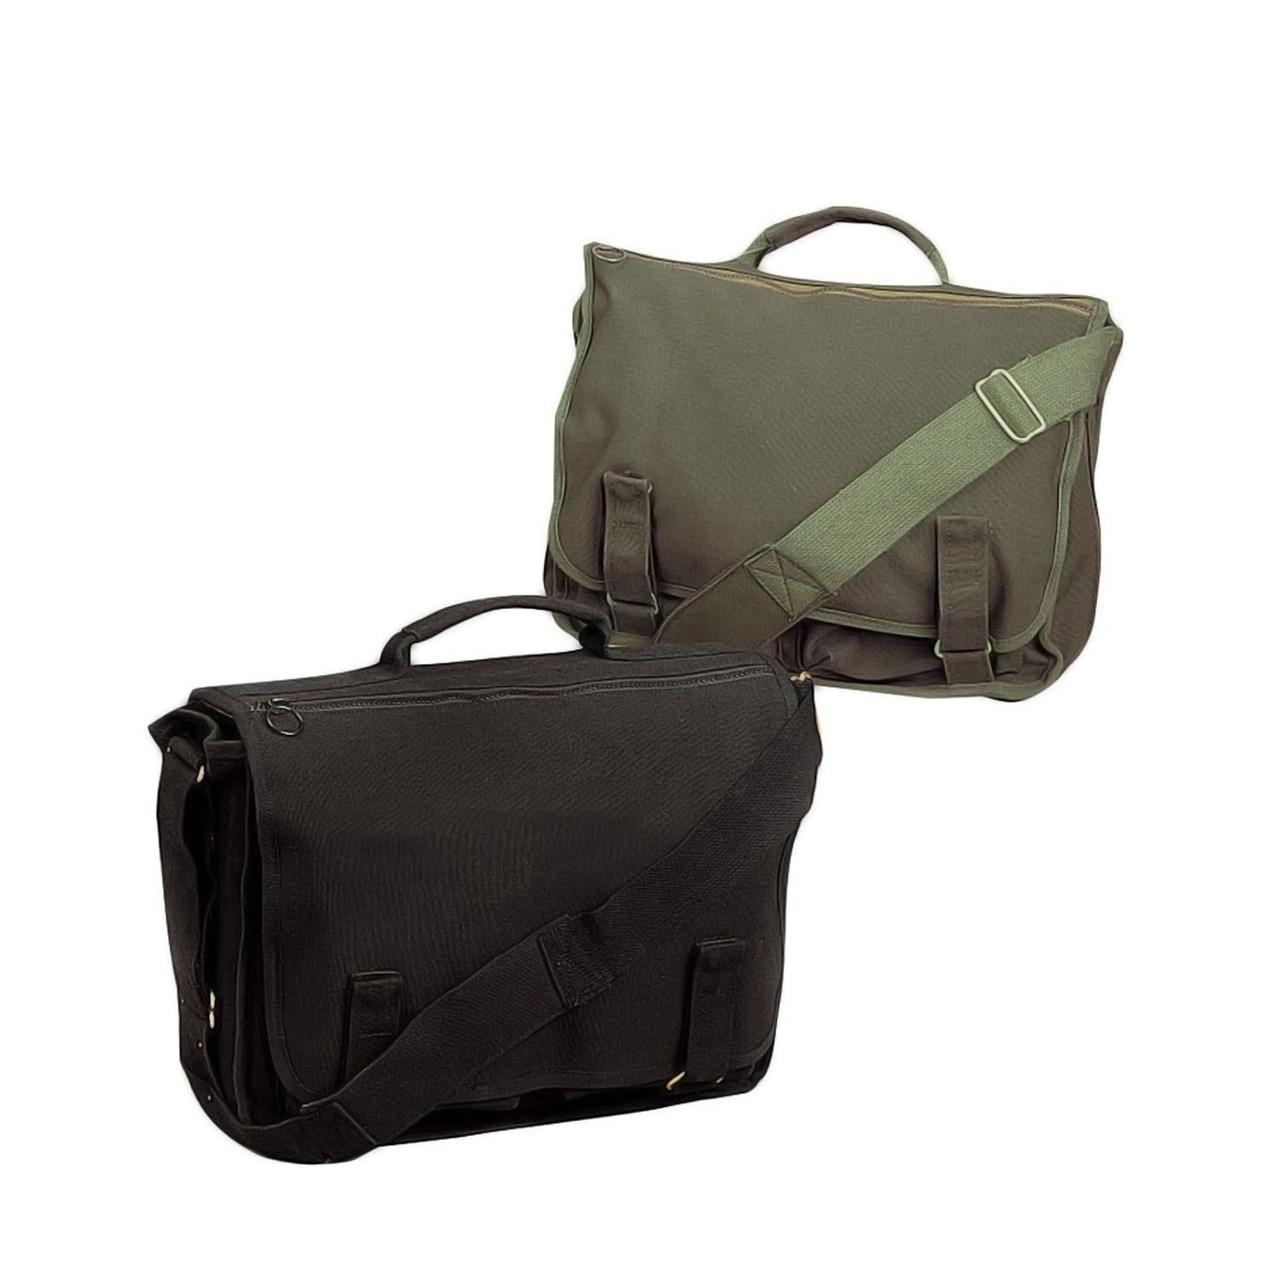 Shop Original Danish Style School Bags Fatigues Army Navy Gear